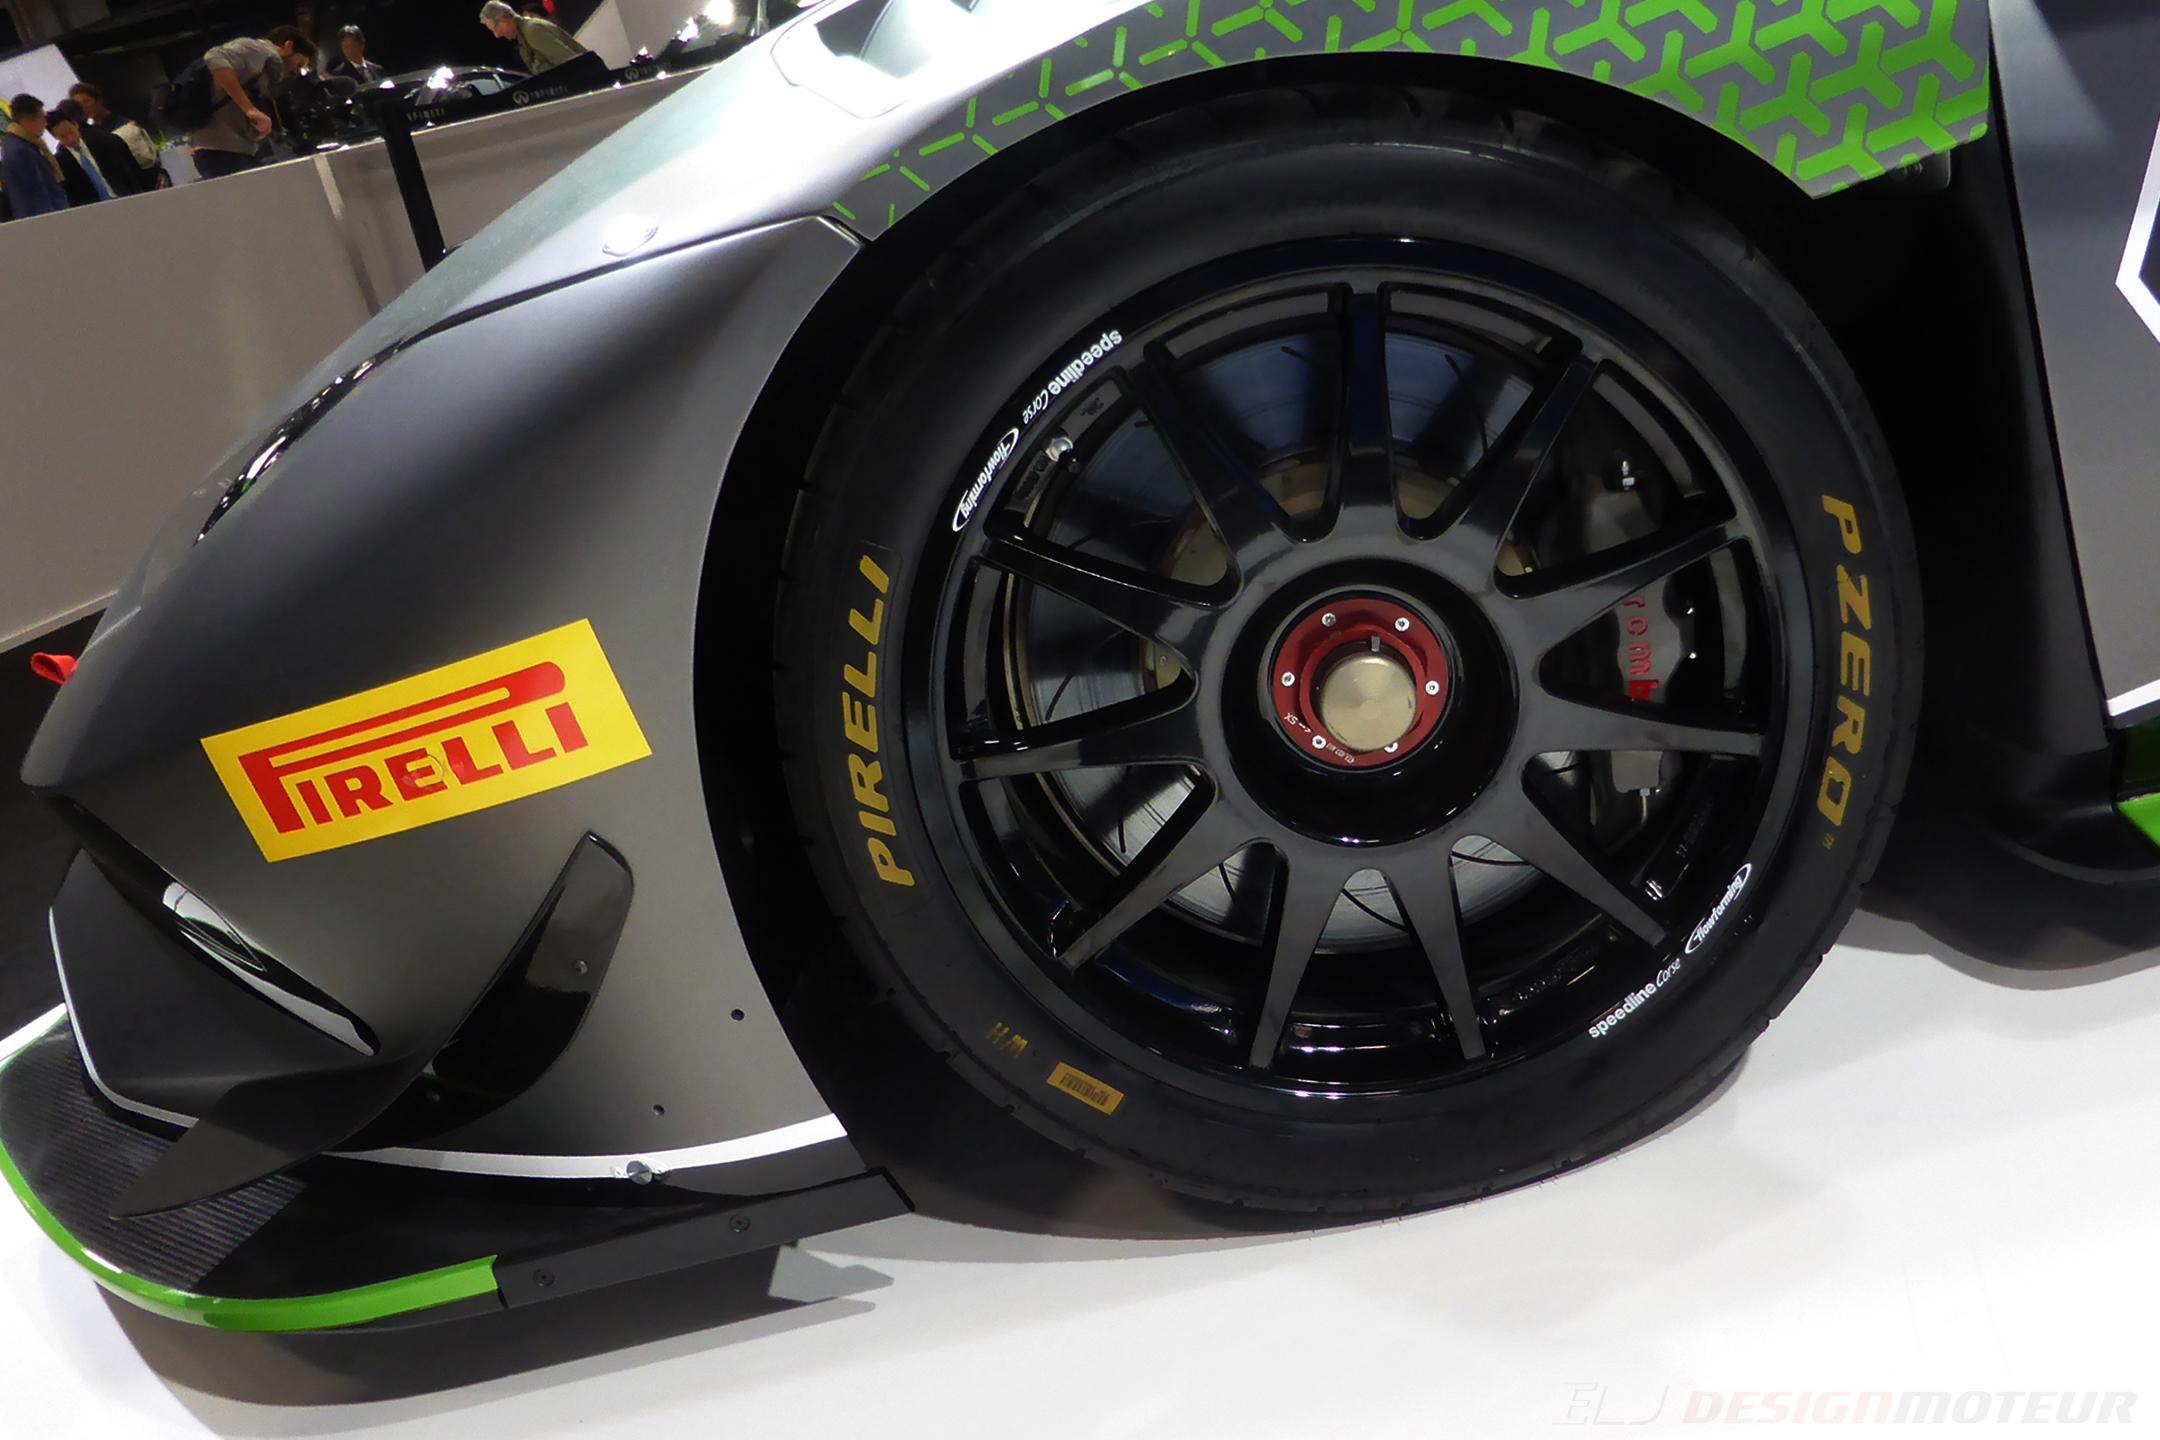 Lamborghini Huracán Super Trofeo Evo - front wheel - Paris Motor Show - 2018 - Mondial Auto -photo ELJ DESIGNMOTEUR